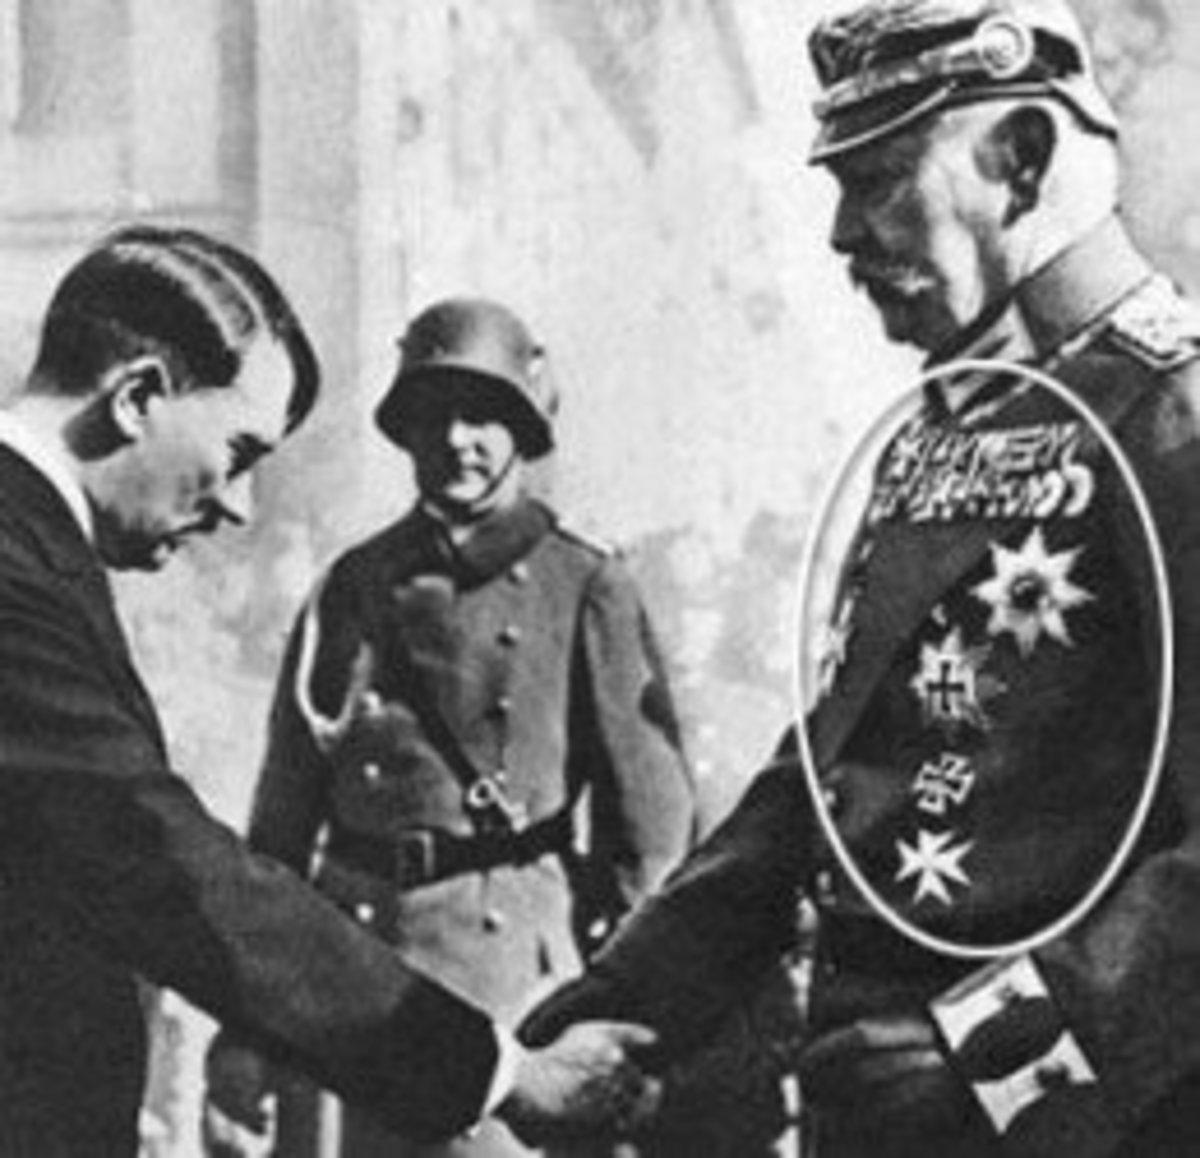 Adolph Hitler and Dietrich Eckhart